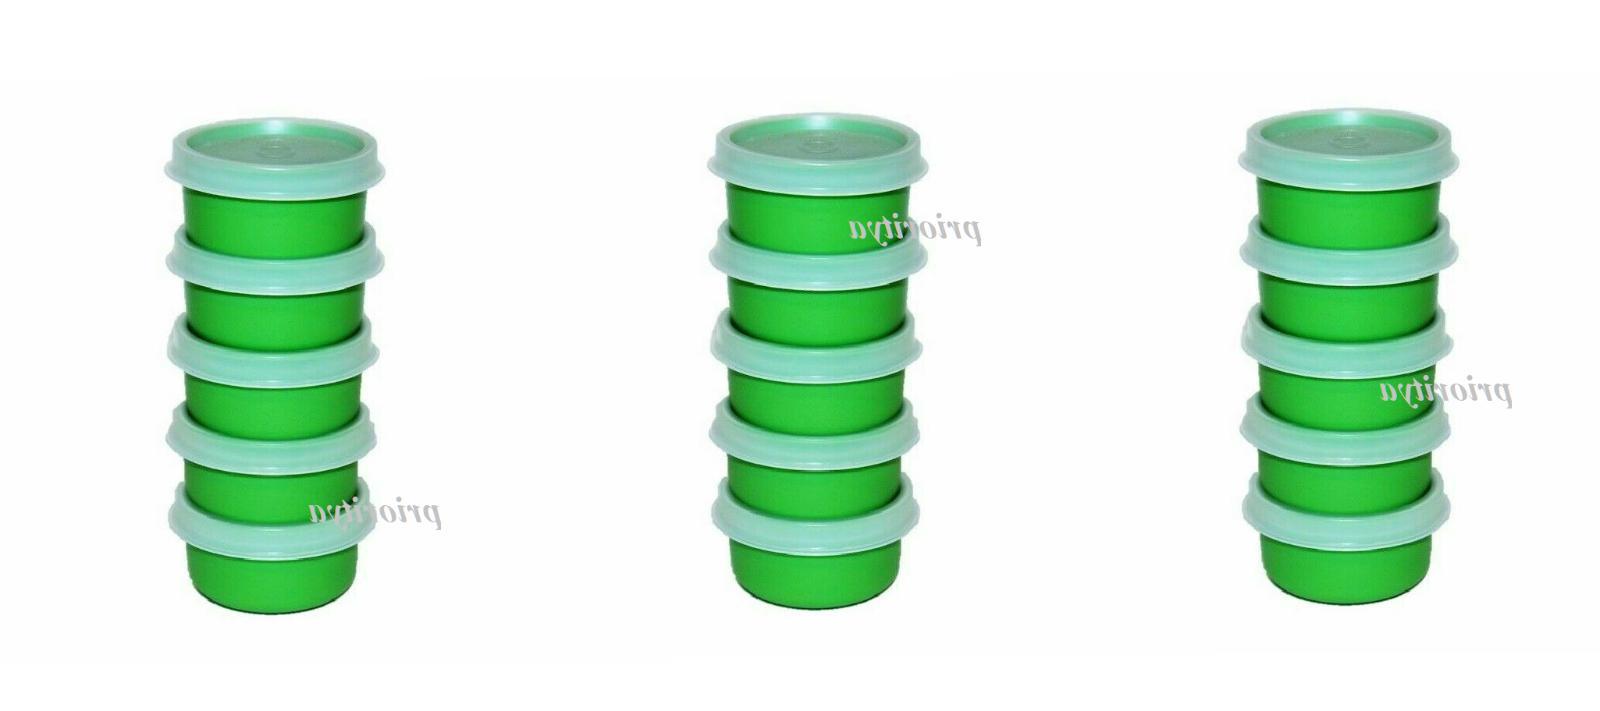 smidgets mini container 1oz each green set